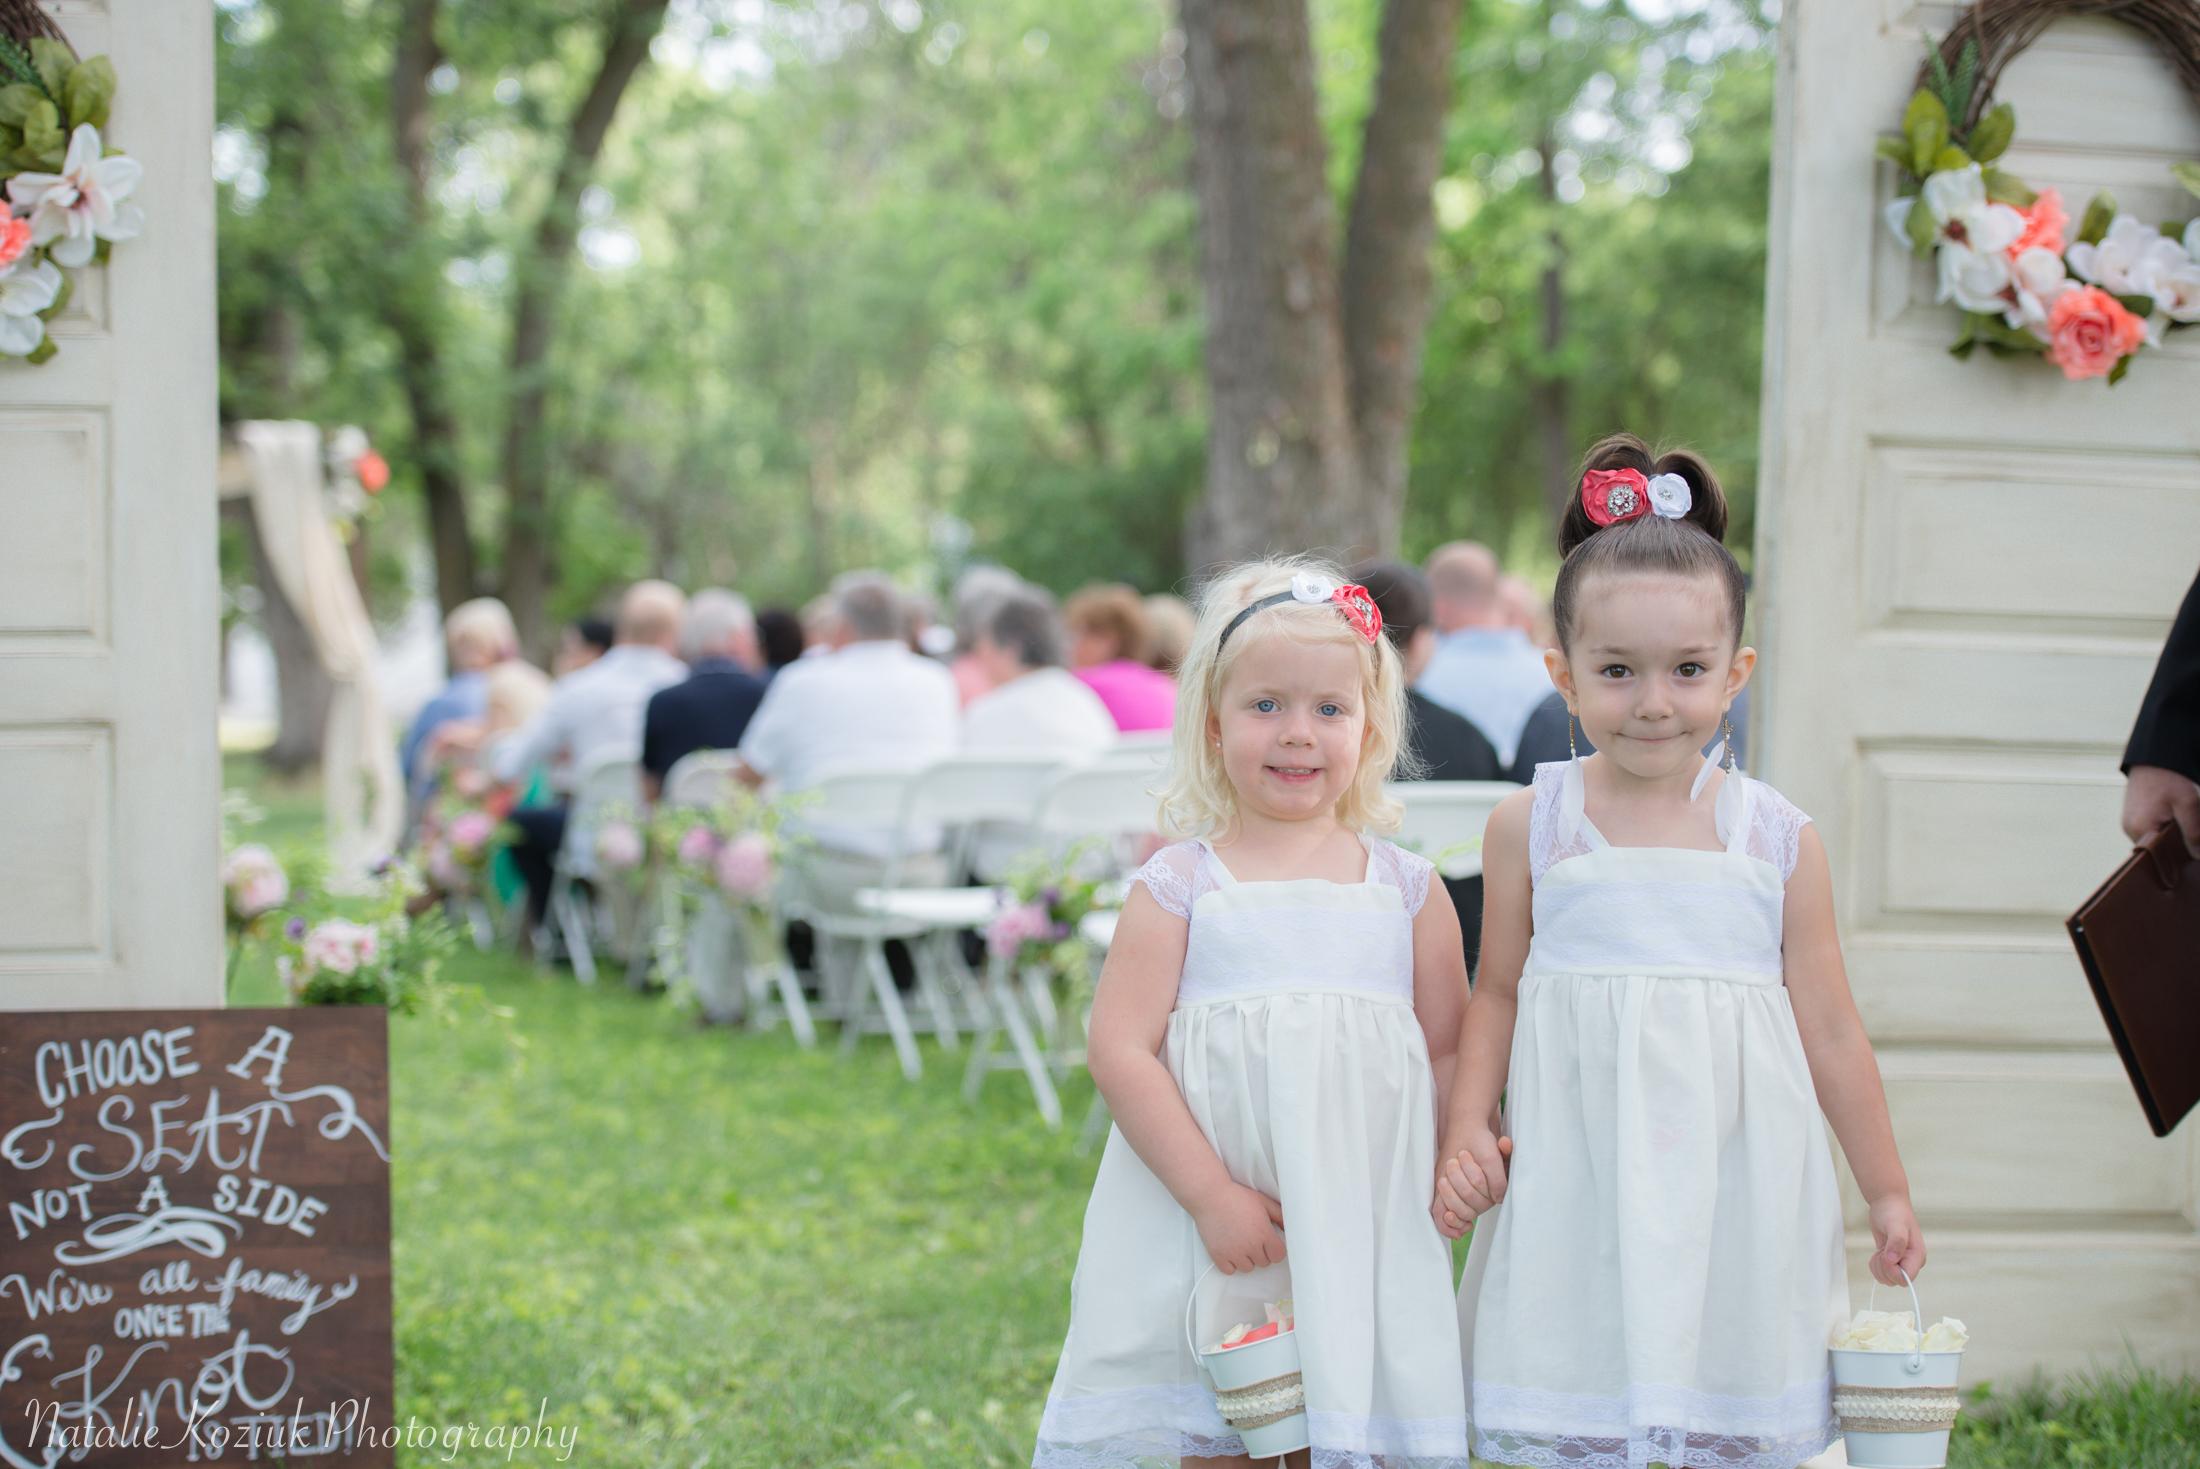 Natalie Koziuk Photography | Boise wedding photographer | flower girls | Star, ID | Bride Groom | nkoziukphotography.com